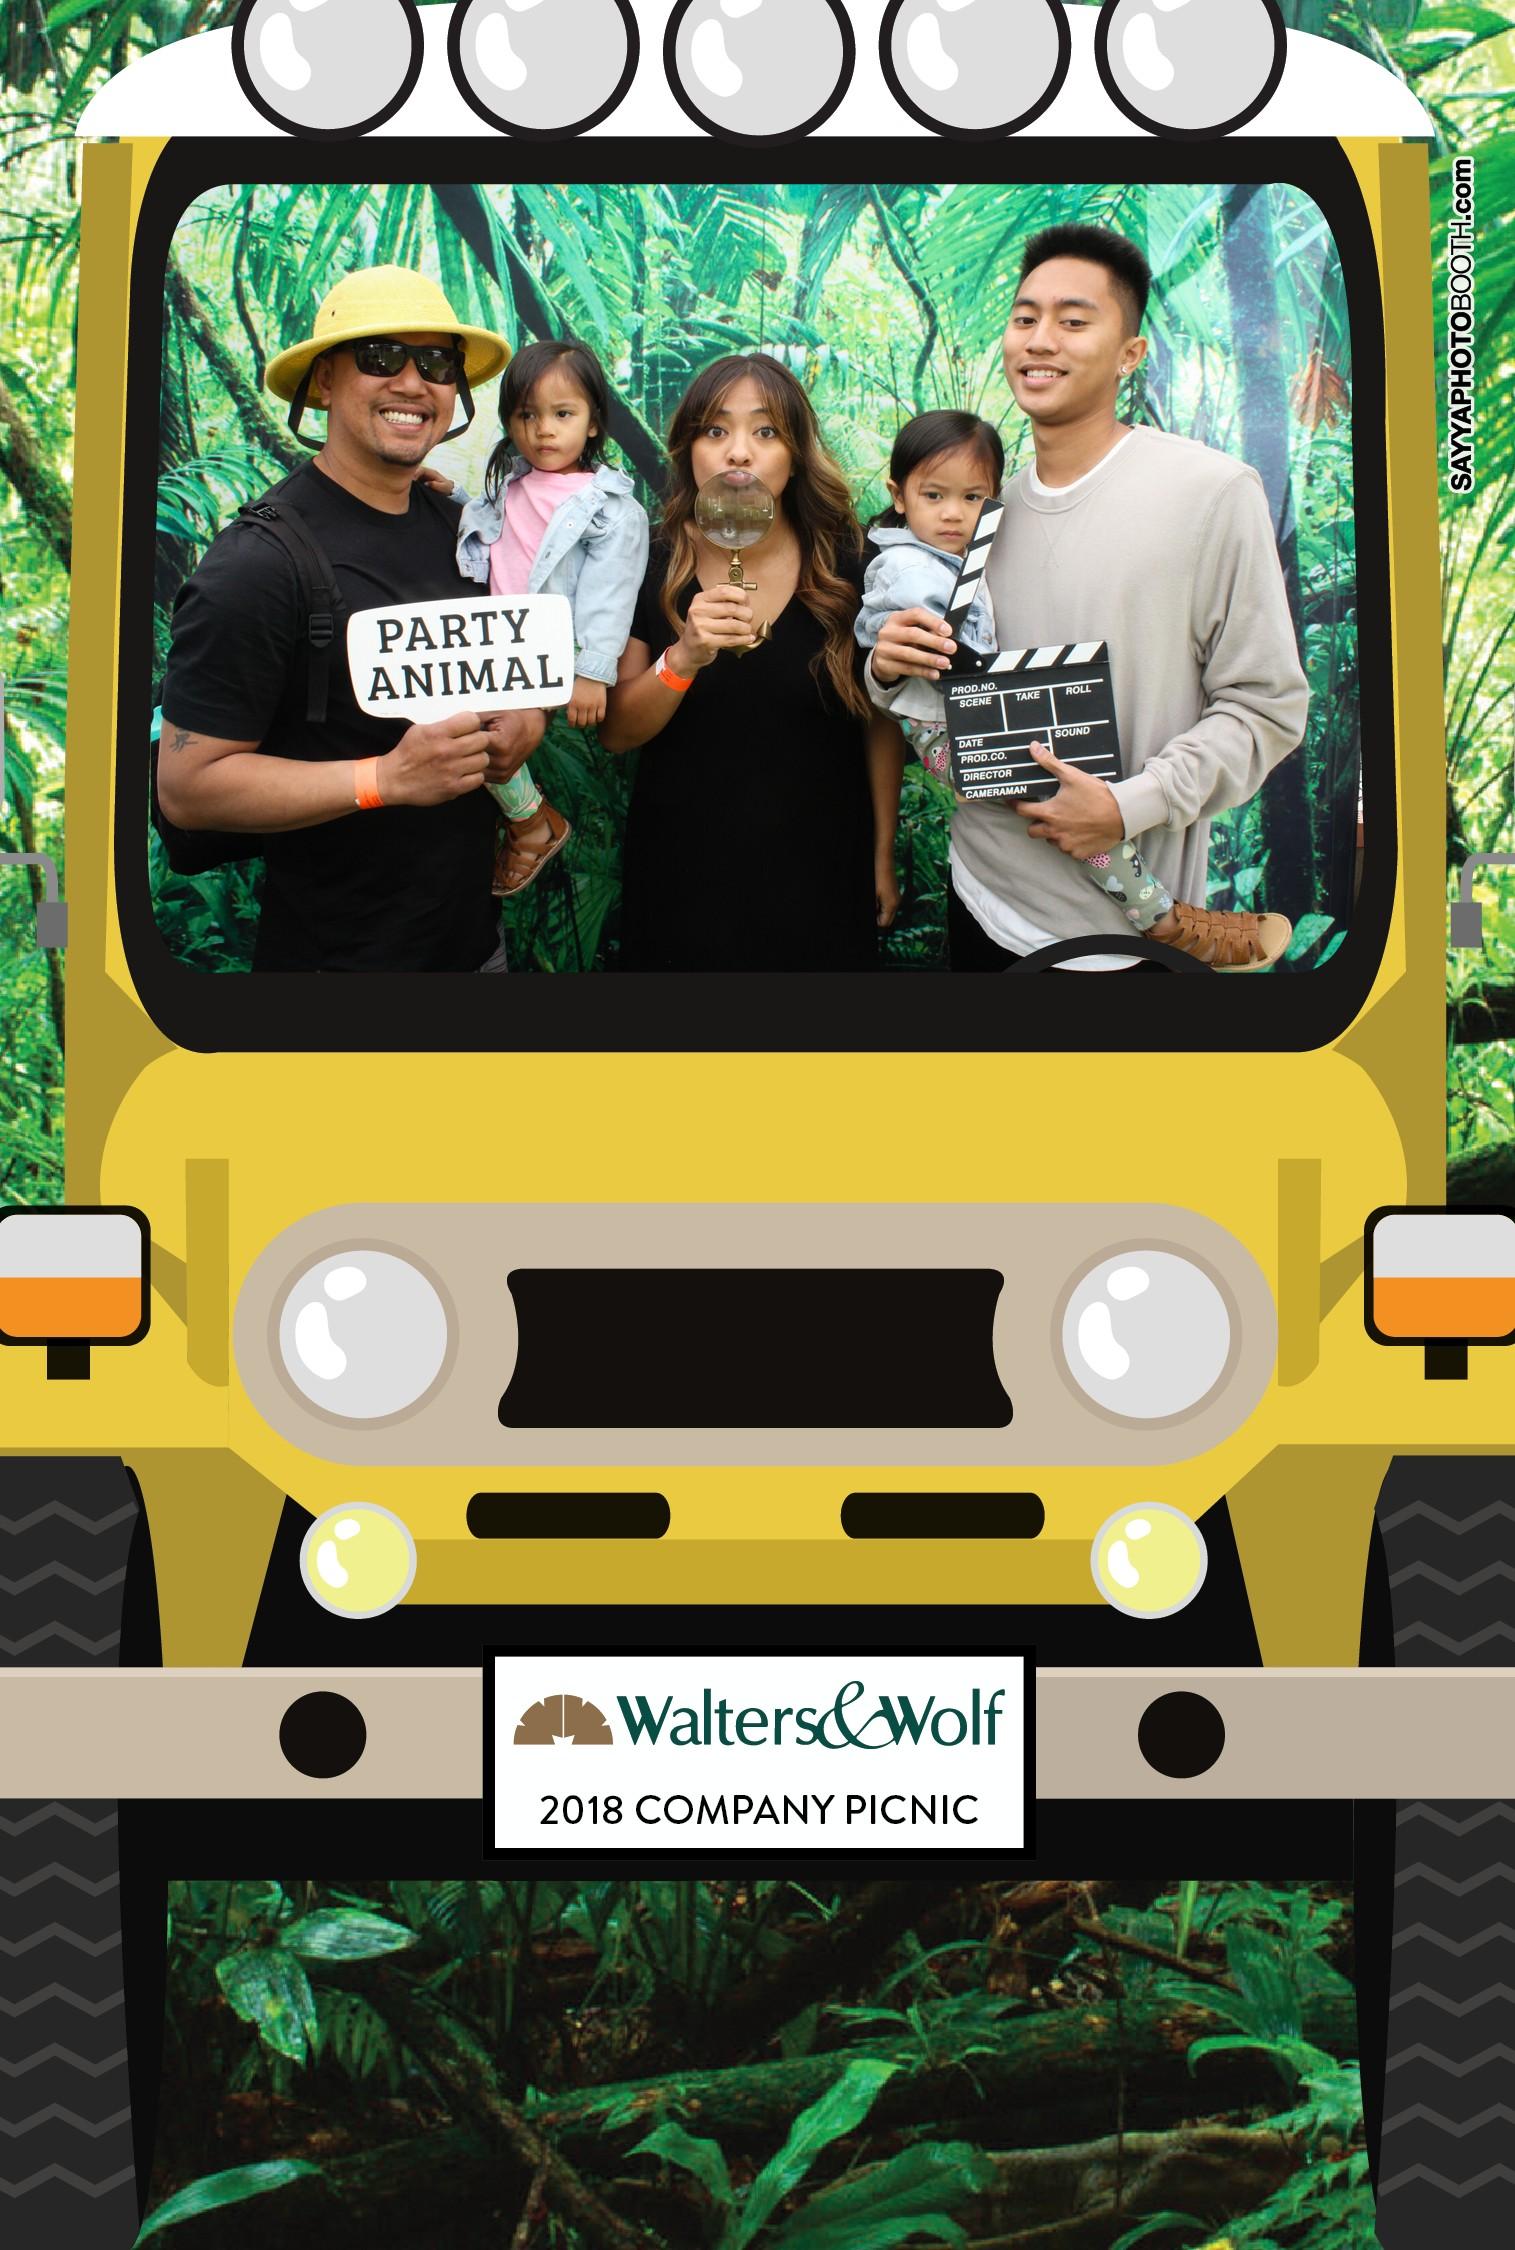 Walters & Wolf Company Picnic - B2